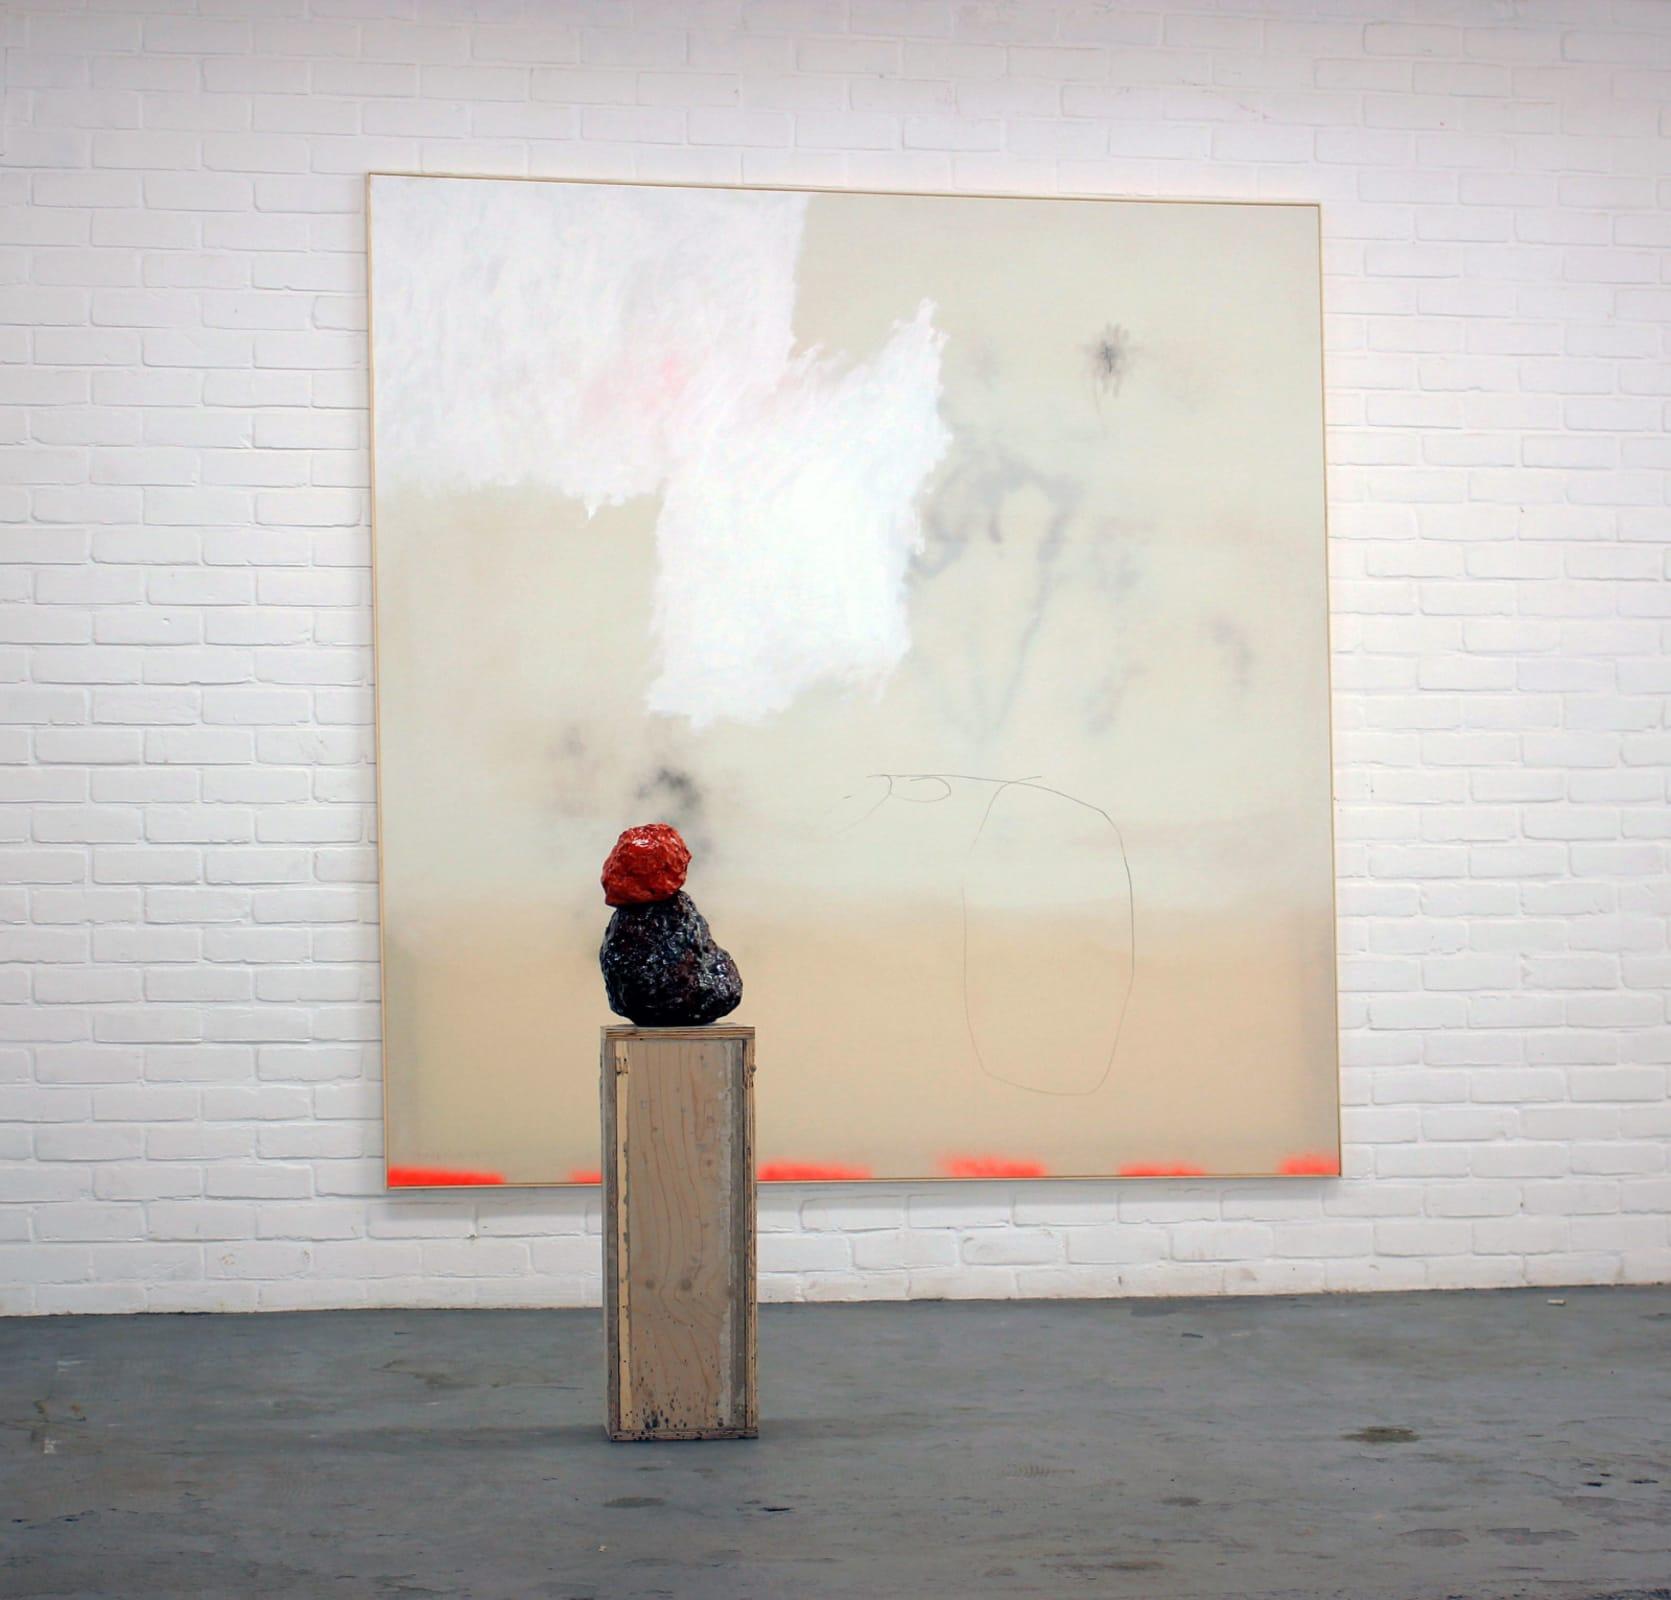 Art Rotterdam 2019, Stéphanie Baechler, Kaspar Dejong,